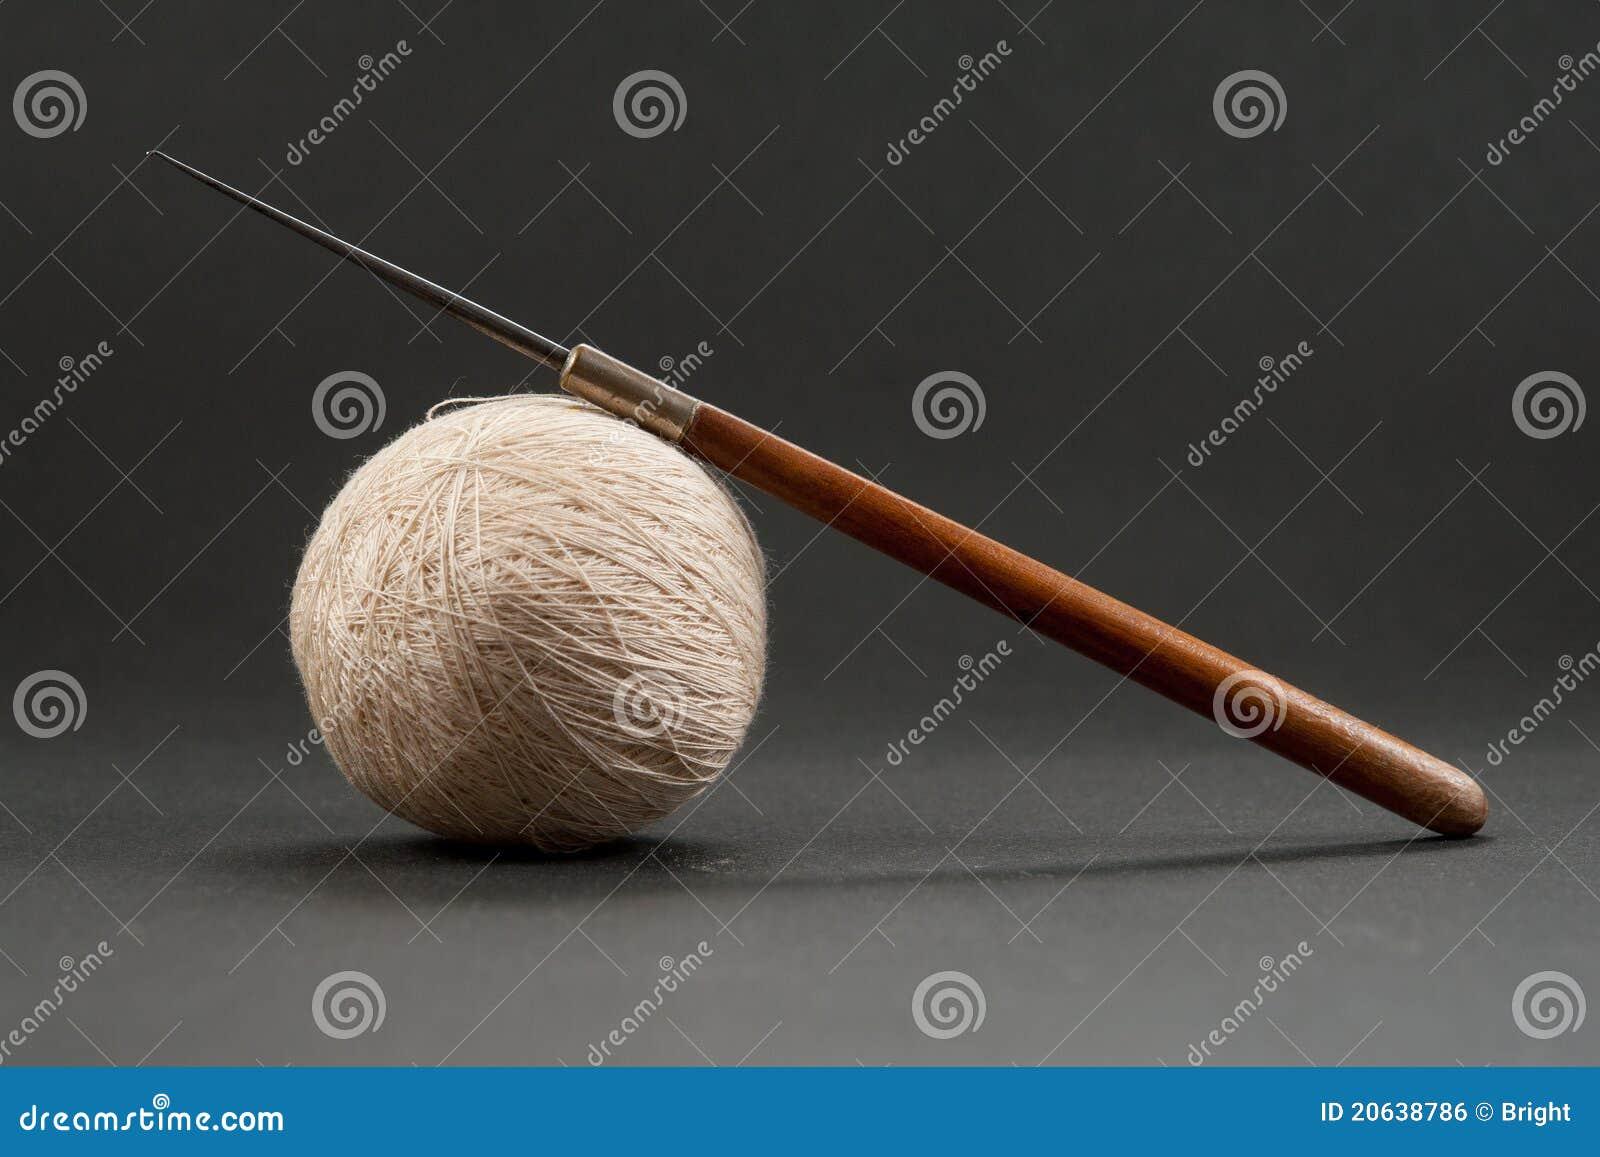 Outils de crochet